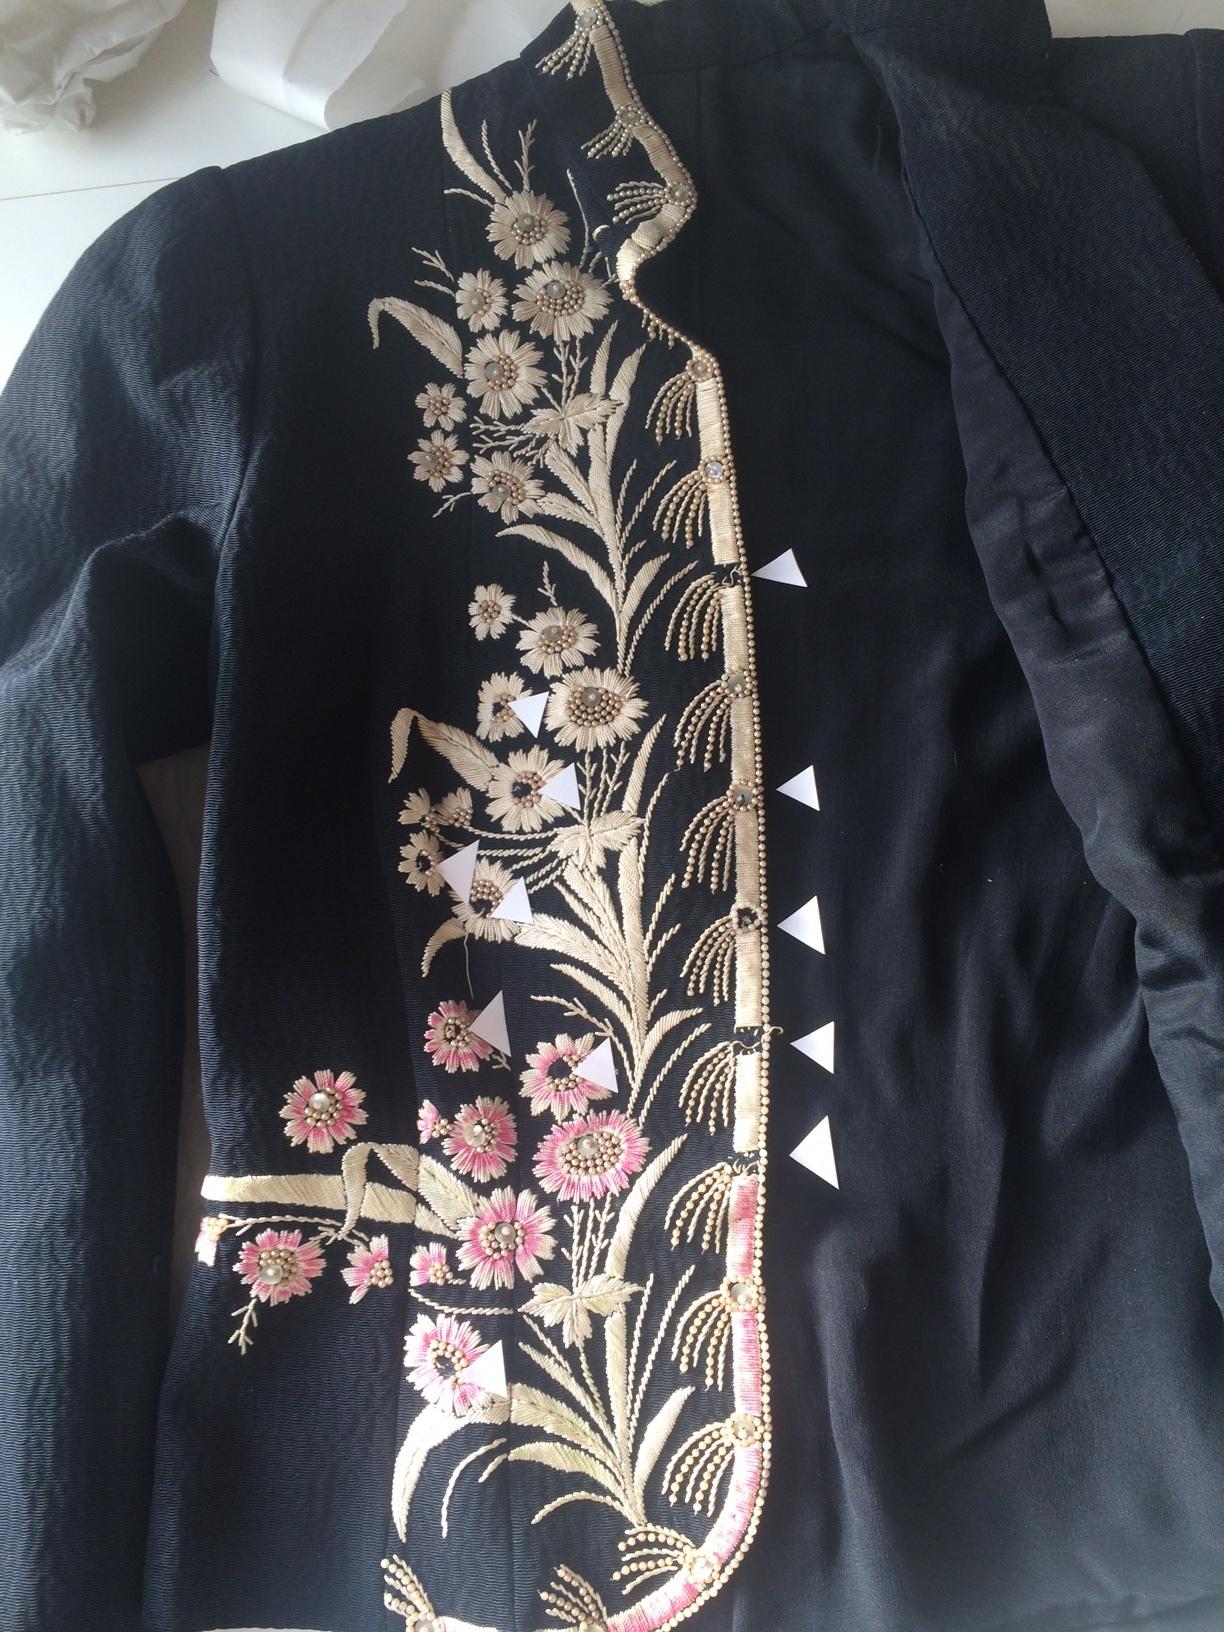 Schiaparelli evening jacket, 1937-8